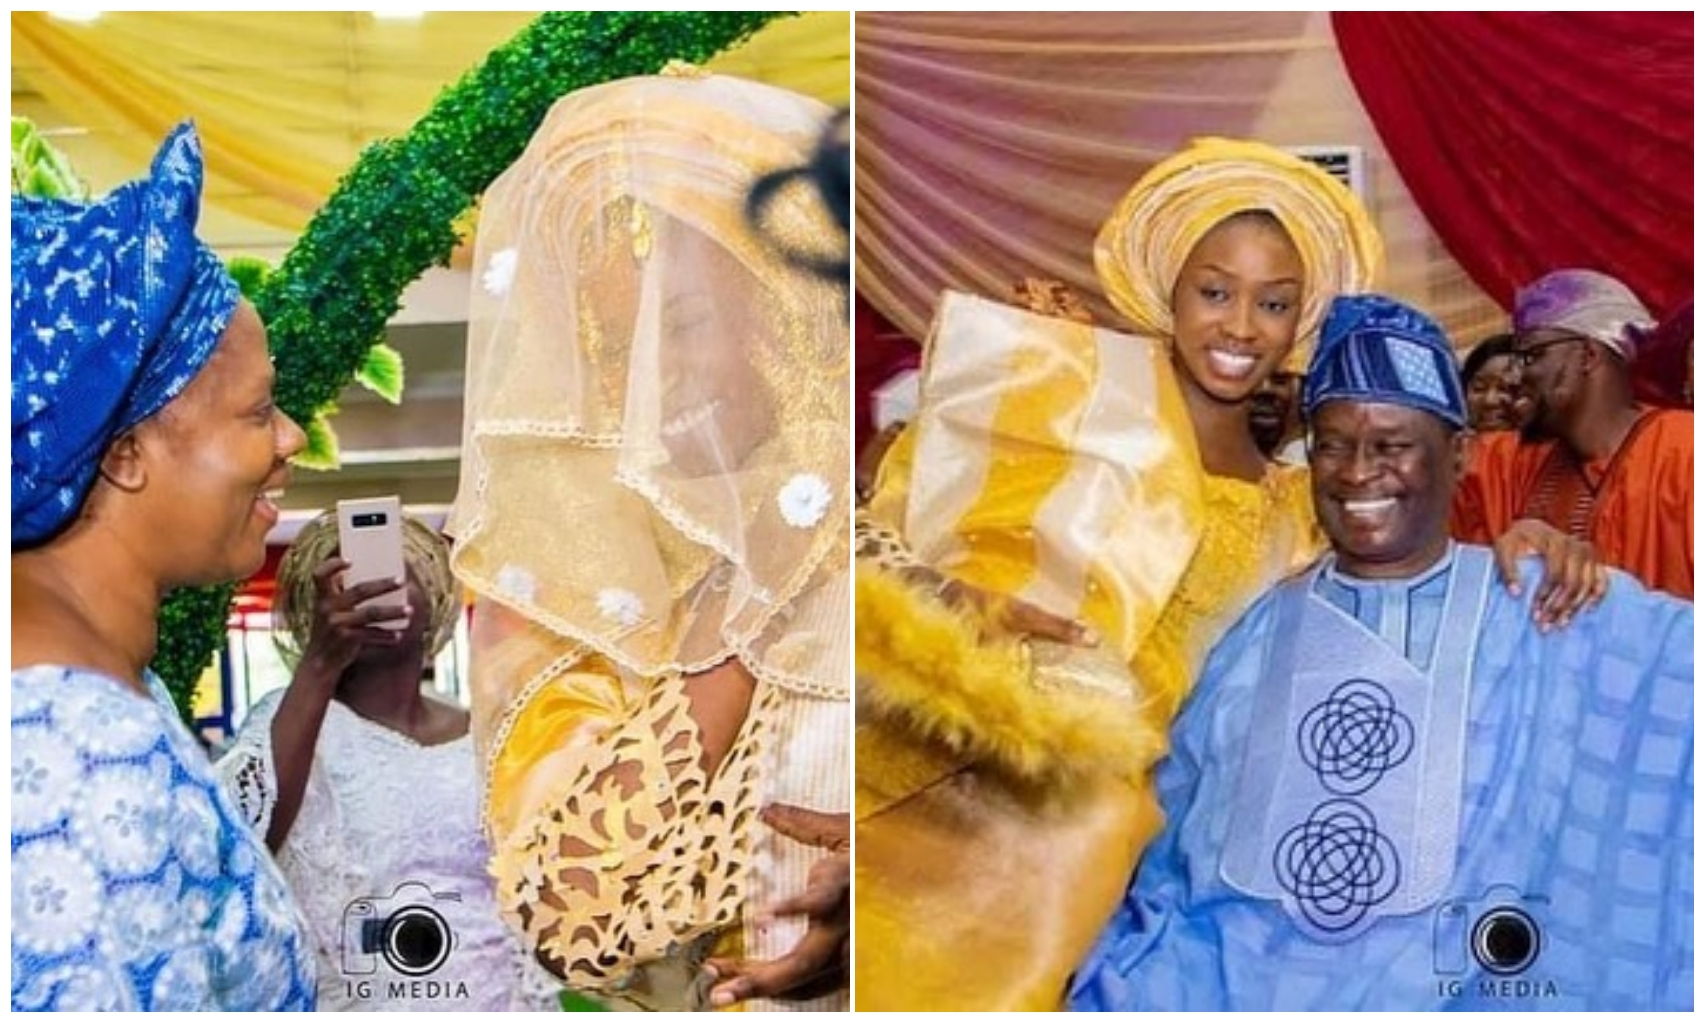 Mike Bamiloye's daughter, Darasimi Weds longtime fiancee, Lawrence (Photos)